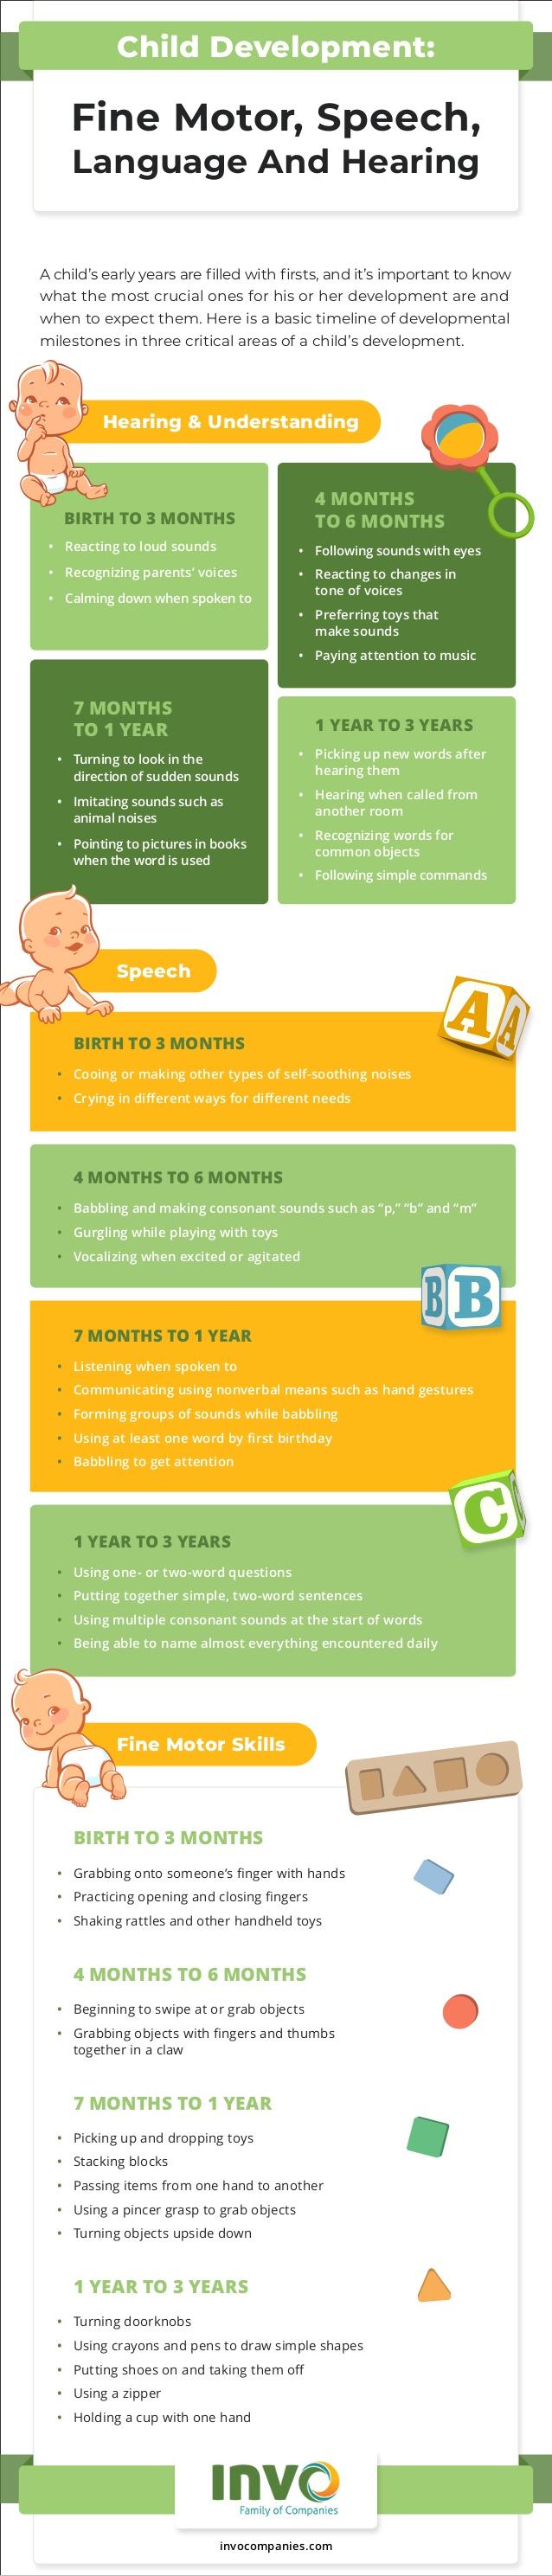 child-development-fine-motor-speech-language-and-hearing-1-638.jpg